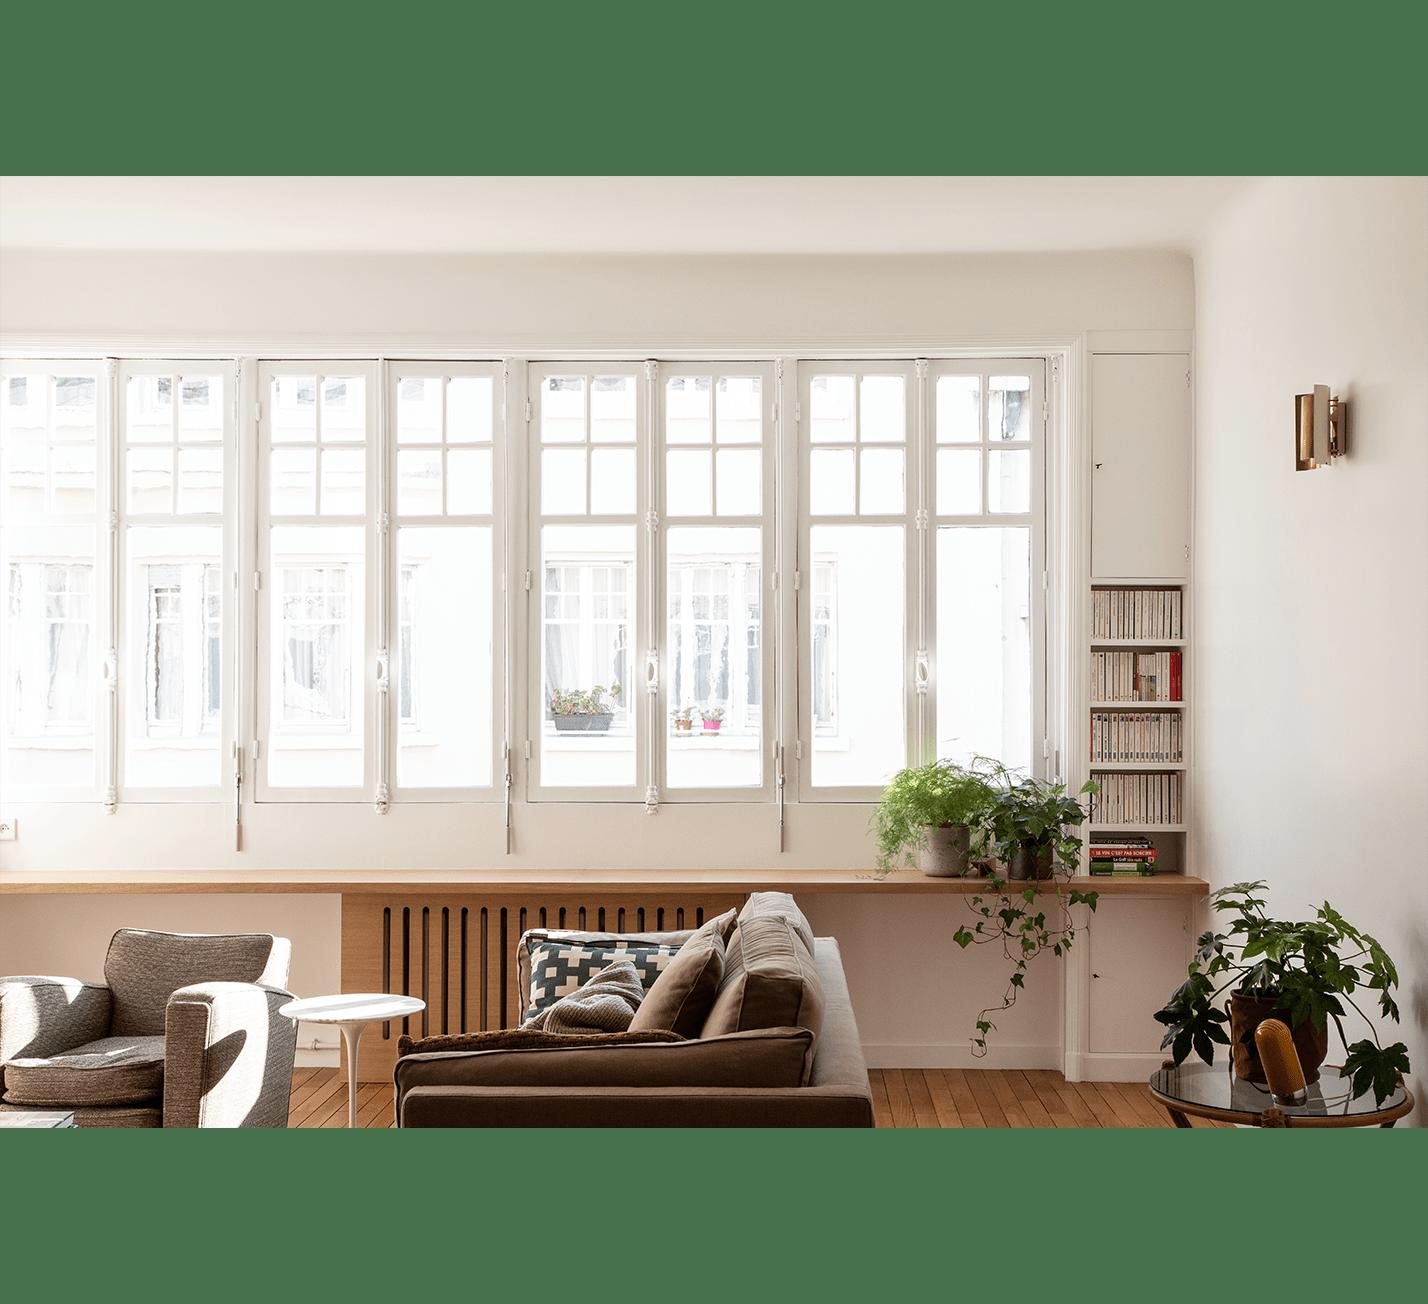 Projet-Emile-Atelier-Steve-Pauline-Borgia-Architecte-interieur-17-min